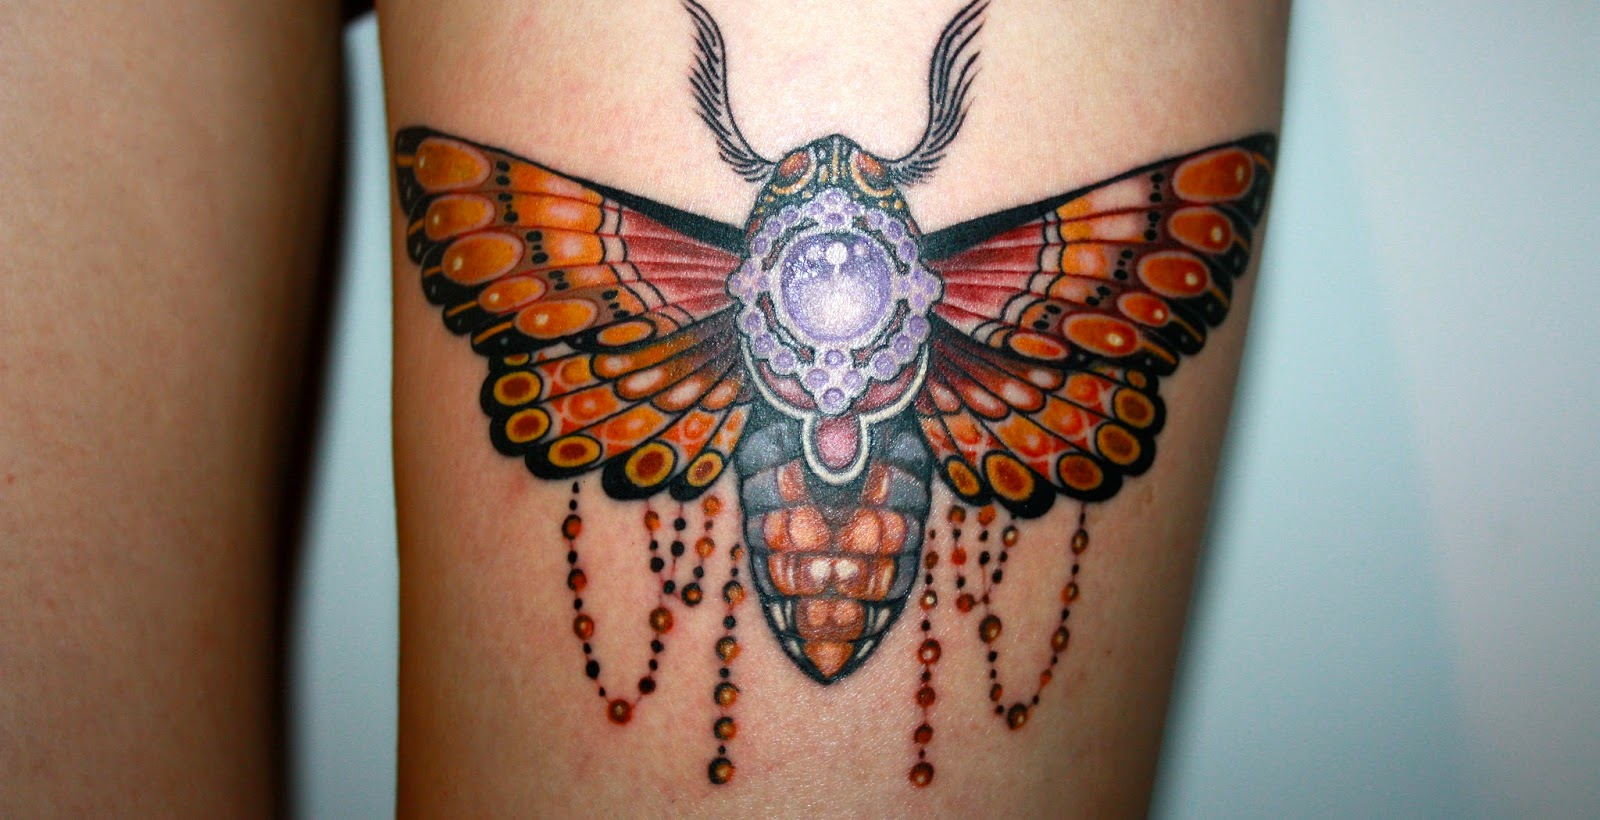 Berlin Allstyle Tattoo Moth Old School inked girls tatted up Luis Orellana